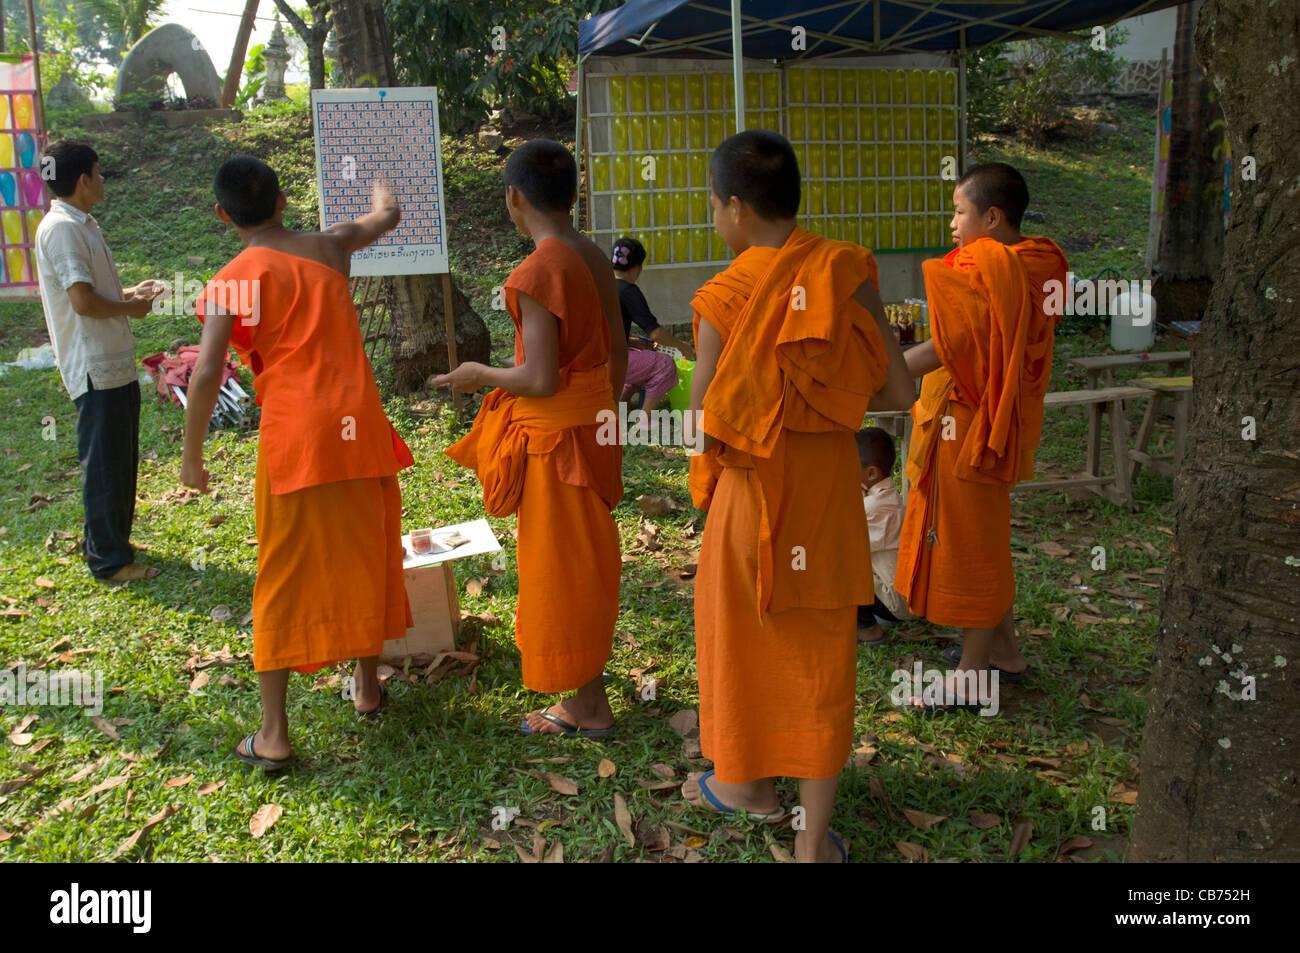 Novice Buddhist monks throwing darts at a sideshow, Lao New Year (Pi Mai Lao), Luang Prabang, Laos - Stock Image